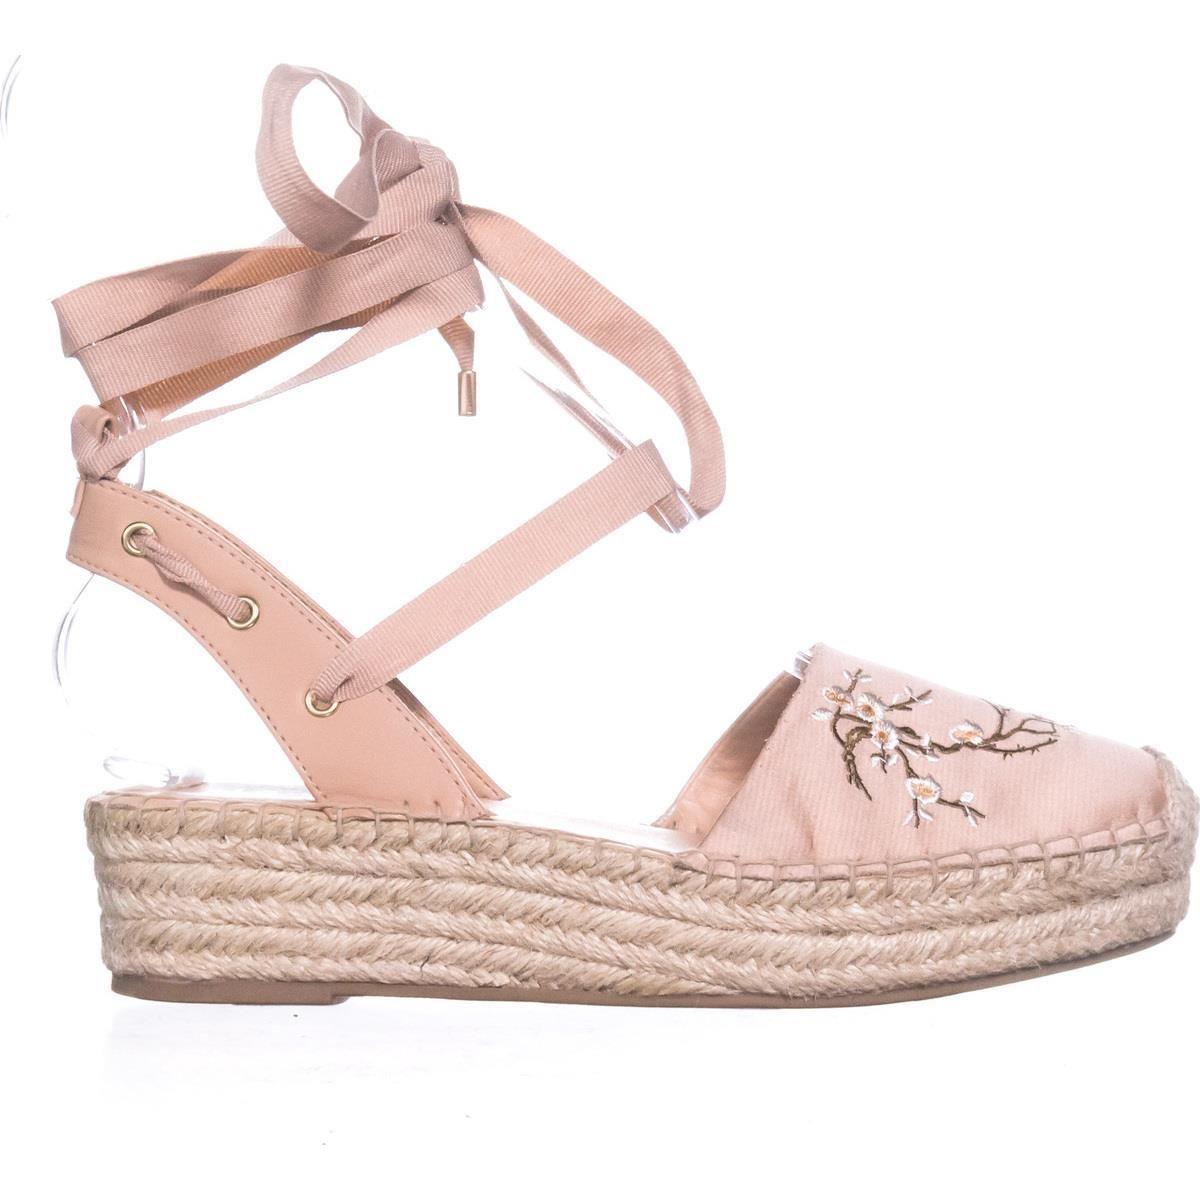 8f0f8b9897e Nanette Lepore Beatriz Espadrille Wedge Sandals Blush 7 US  sandals  flat   espadrilles  platforms  blush  spring  springoutfits  casualsummeroutfits   summer ...